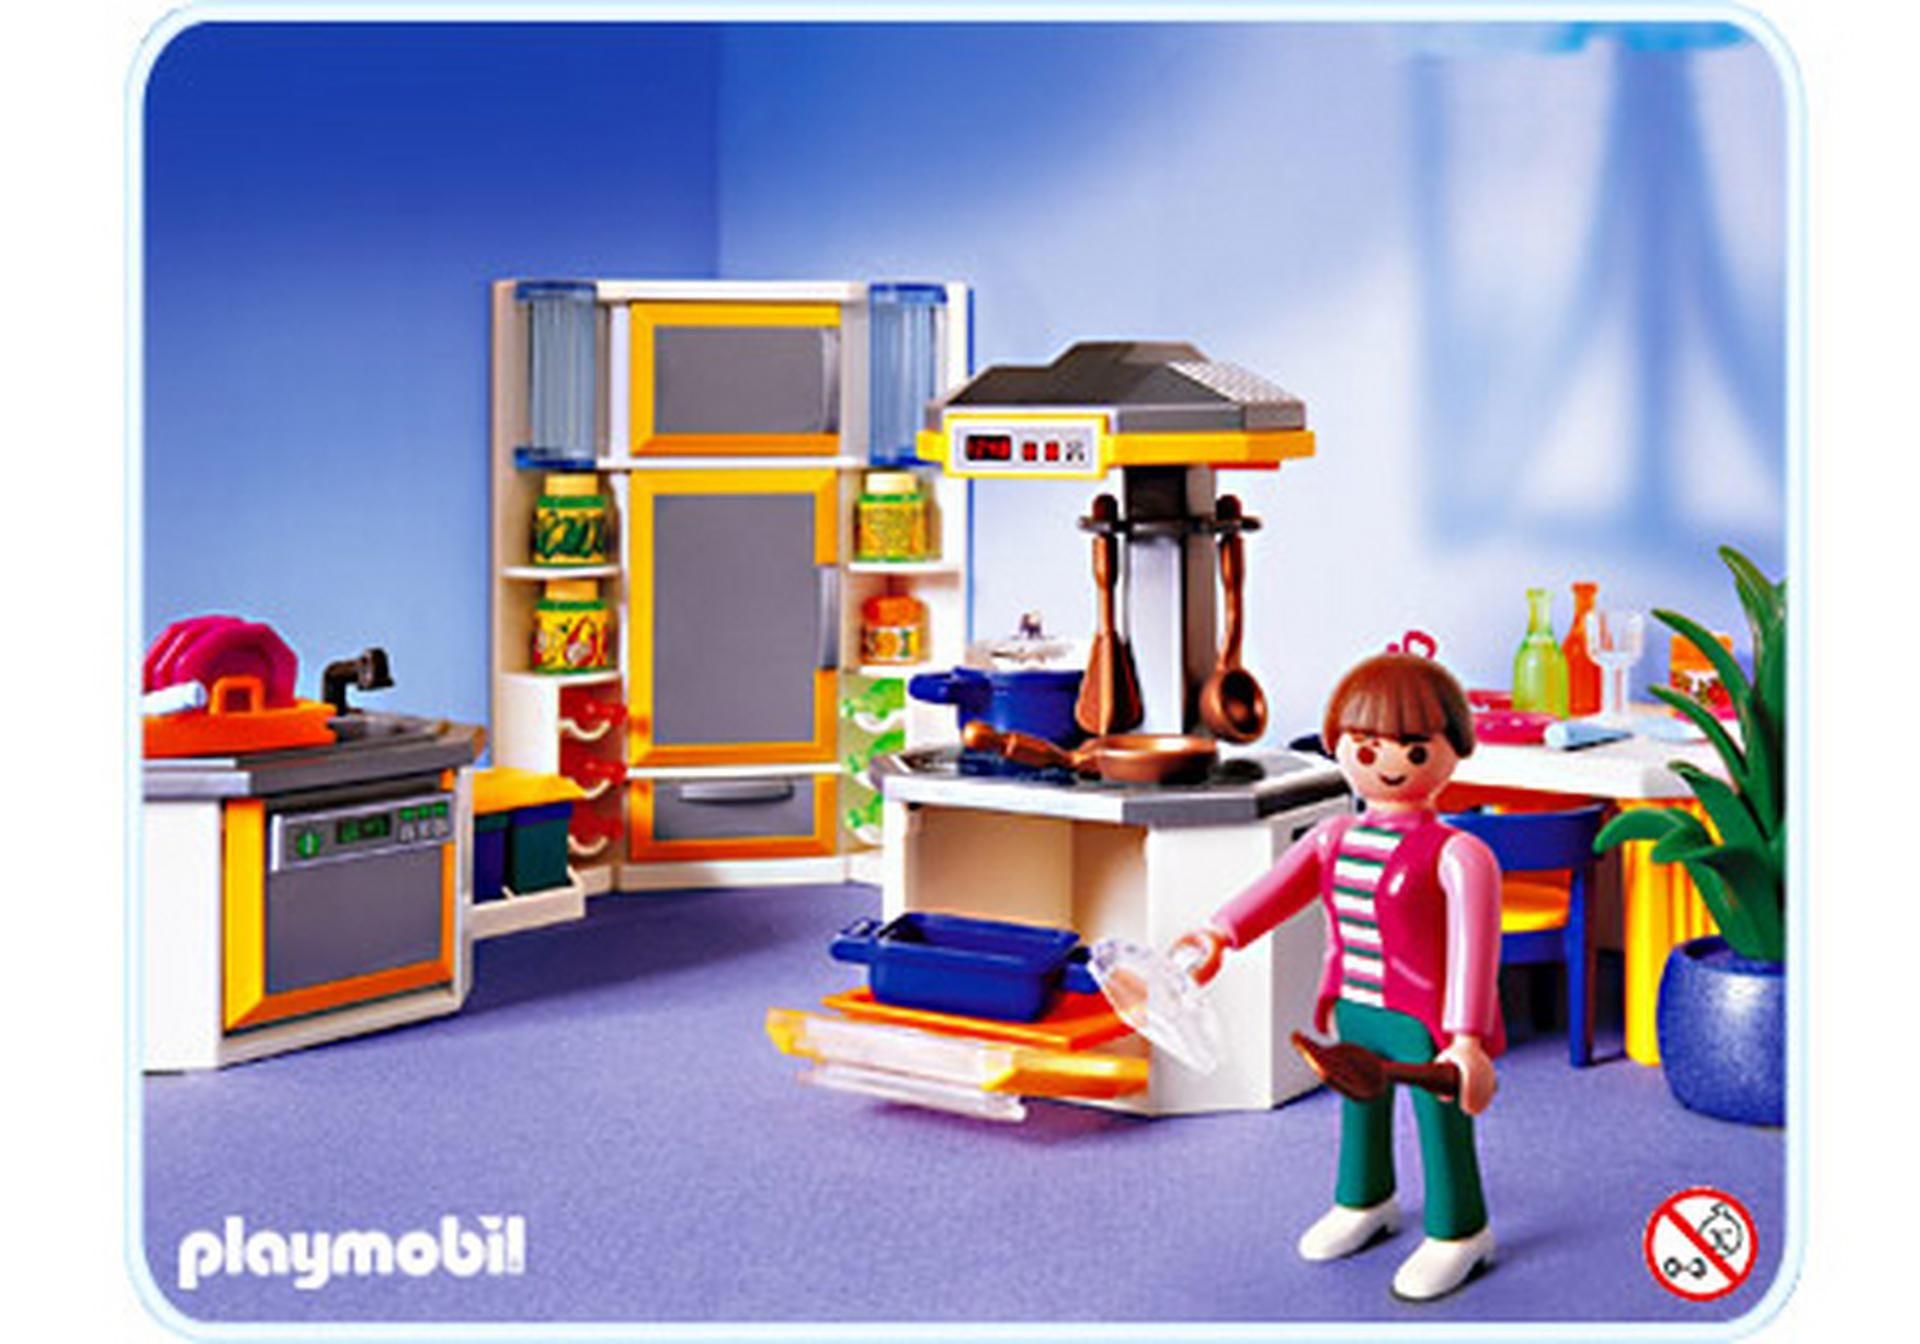 Playmobil 3968 Einbaukuche Http Www Playmodb Org Cgi Bin Showinv Pl Setnum 3968 Pics On Einbaukuche Playmobil Kuche